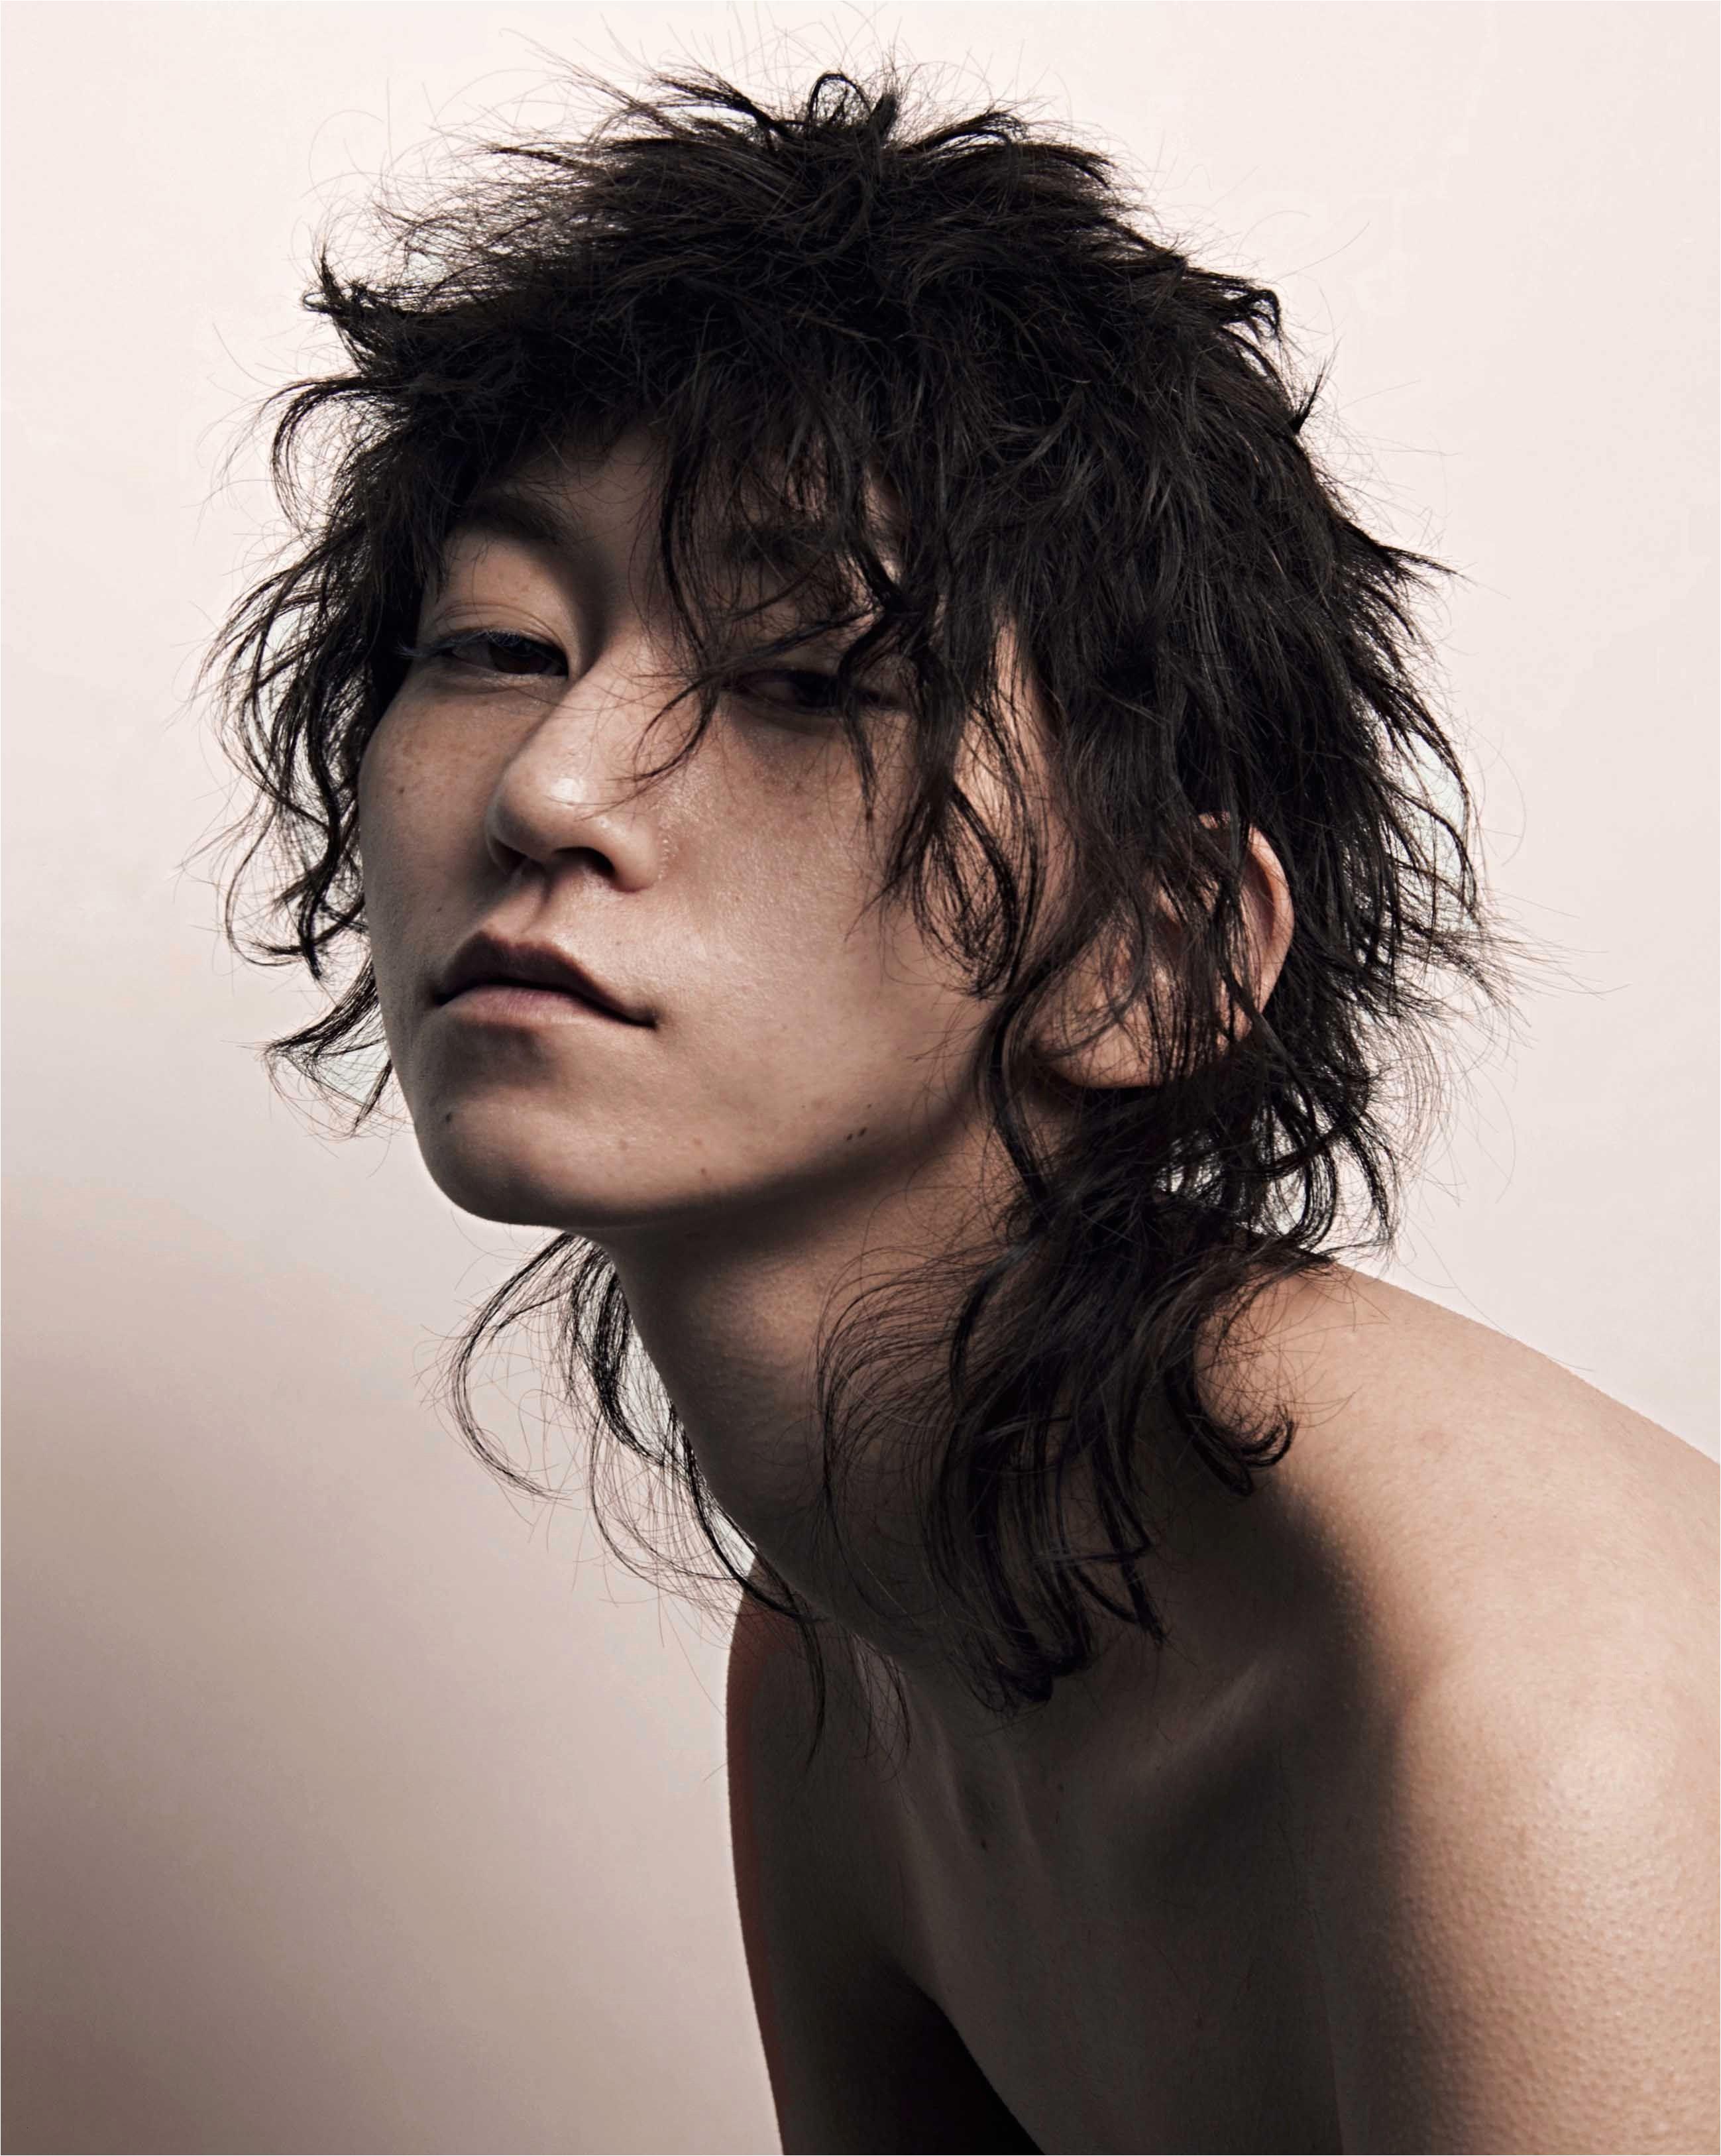 Short Hairstyles asian Hair Lovely Captivating Short Hairstyles for Men New Hairstyles Men 0d Bright